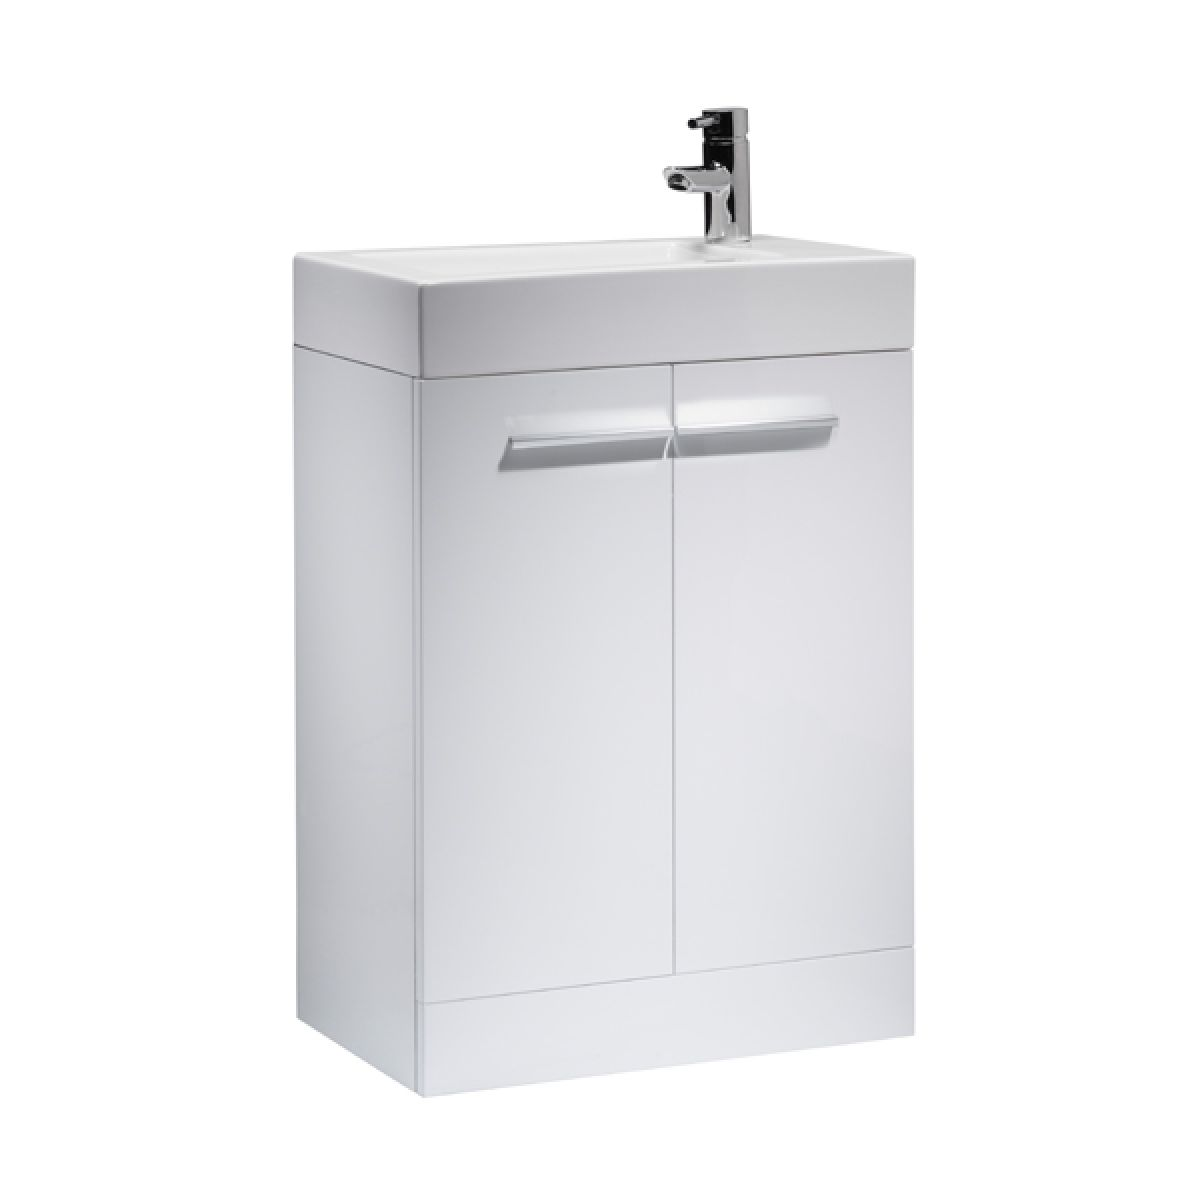 Tavistock Kobe White Floor Mounted Vanity Unit 560mm